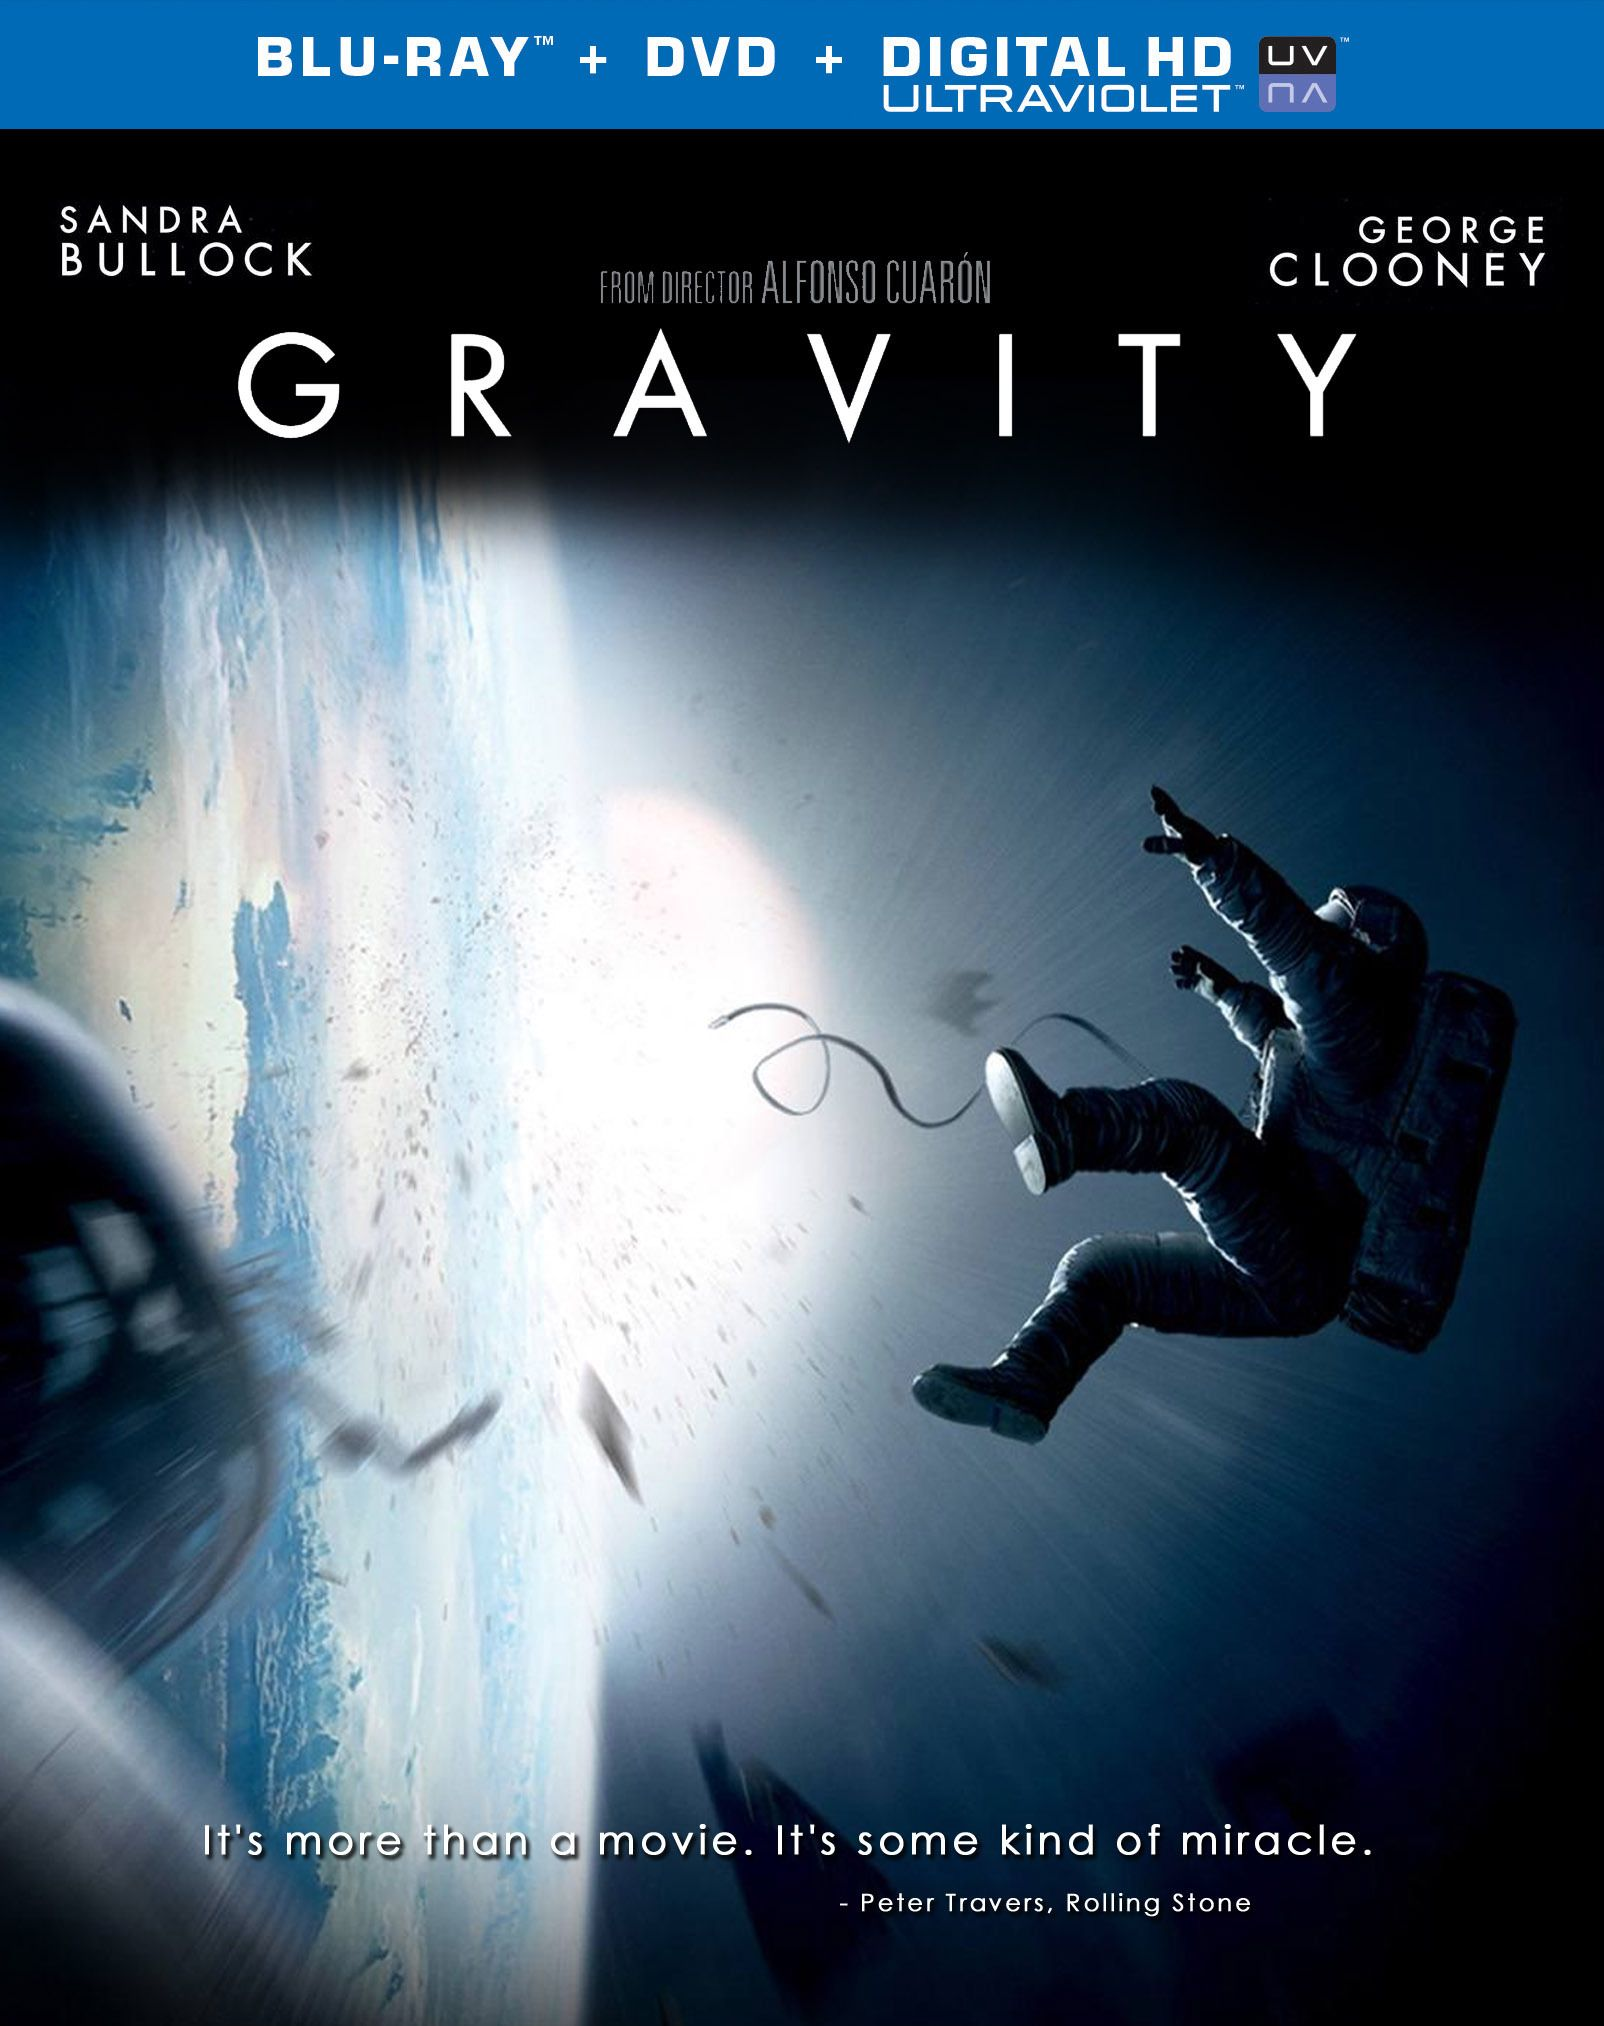 Gravity 2013 Mkv Md Mp3 720p Bluray Ita Rev Movies To